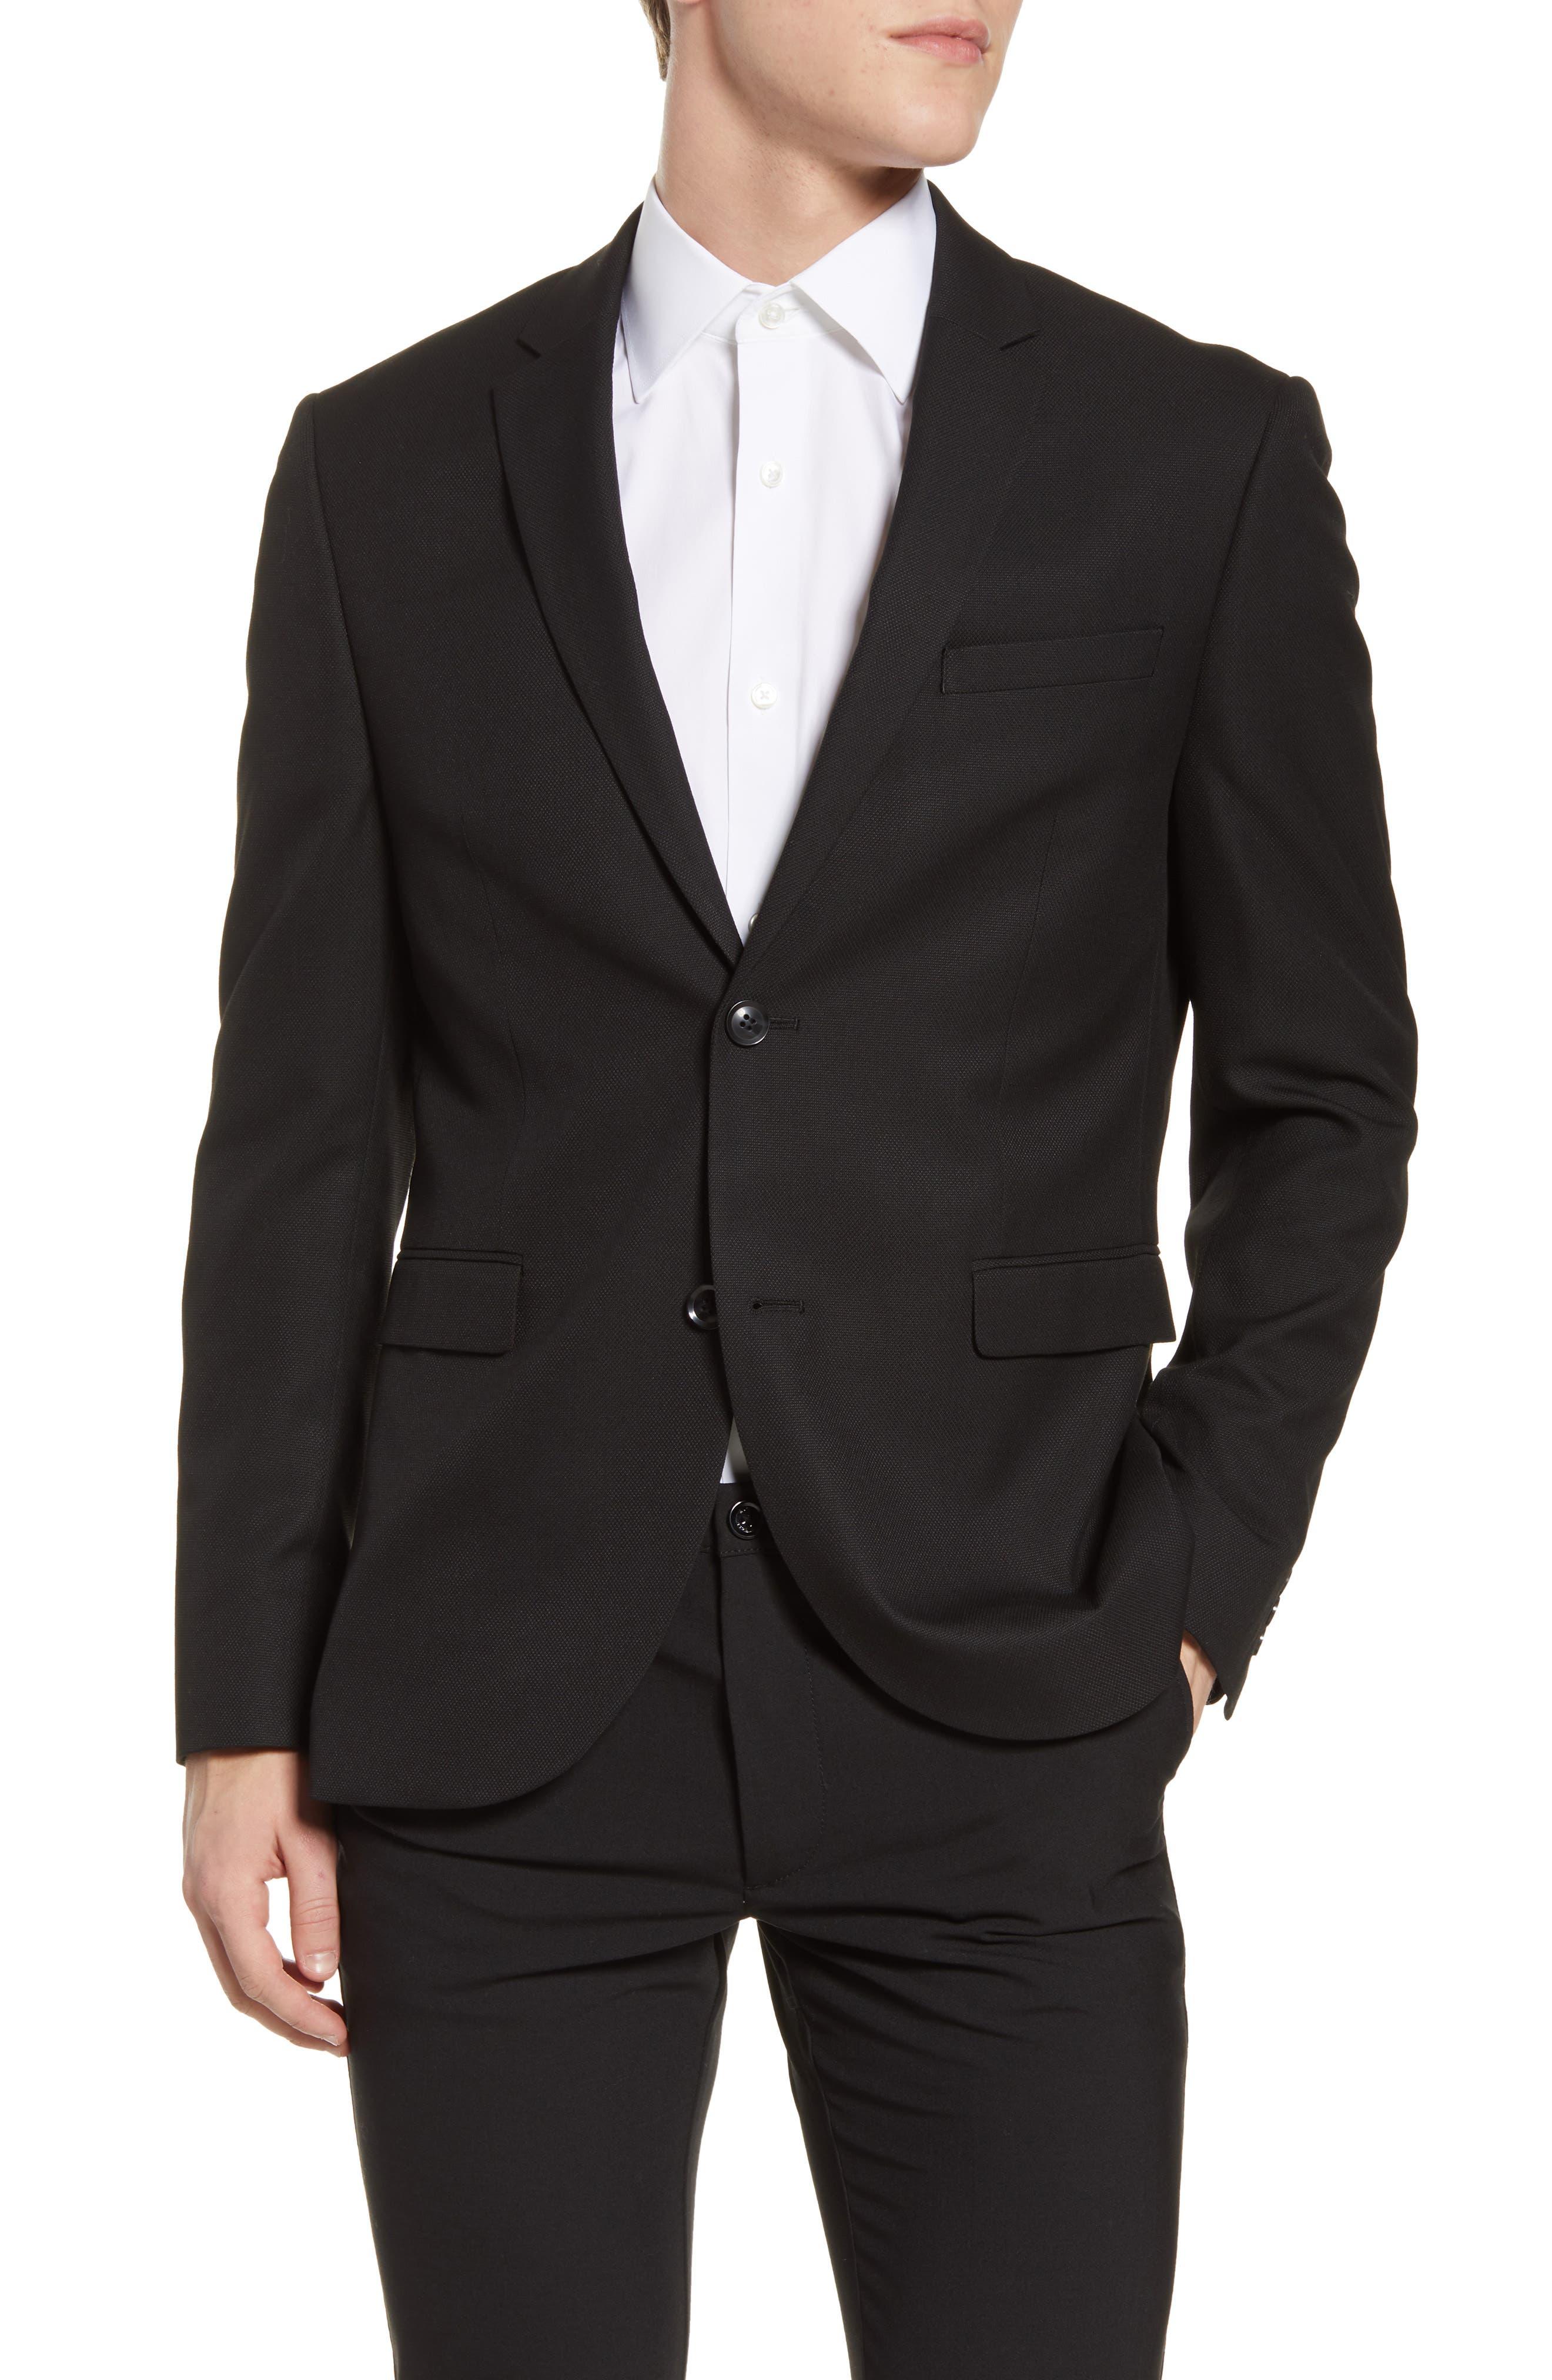 Size 44S Jacket /& 37S Pants Formal Dress Wedding Men/'s Black Tuxedo Prom